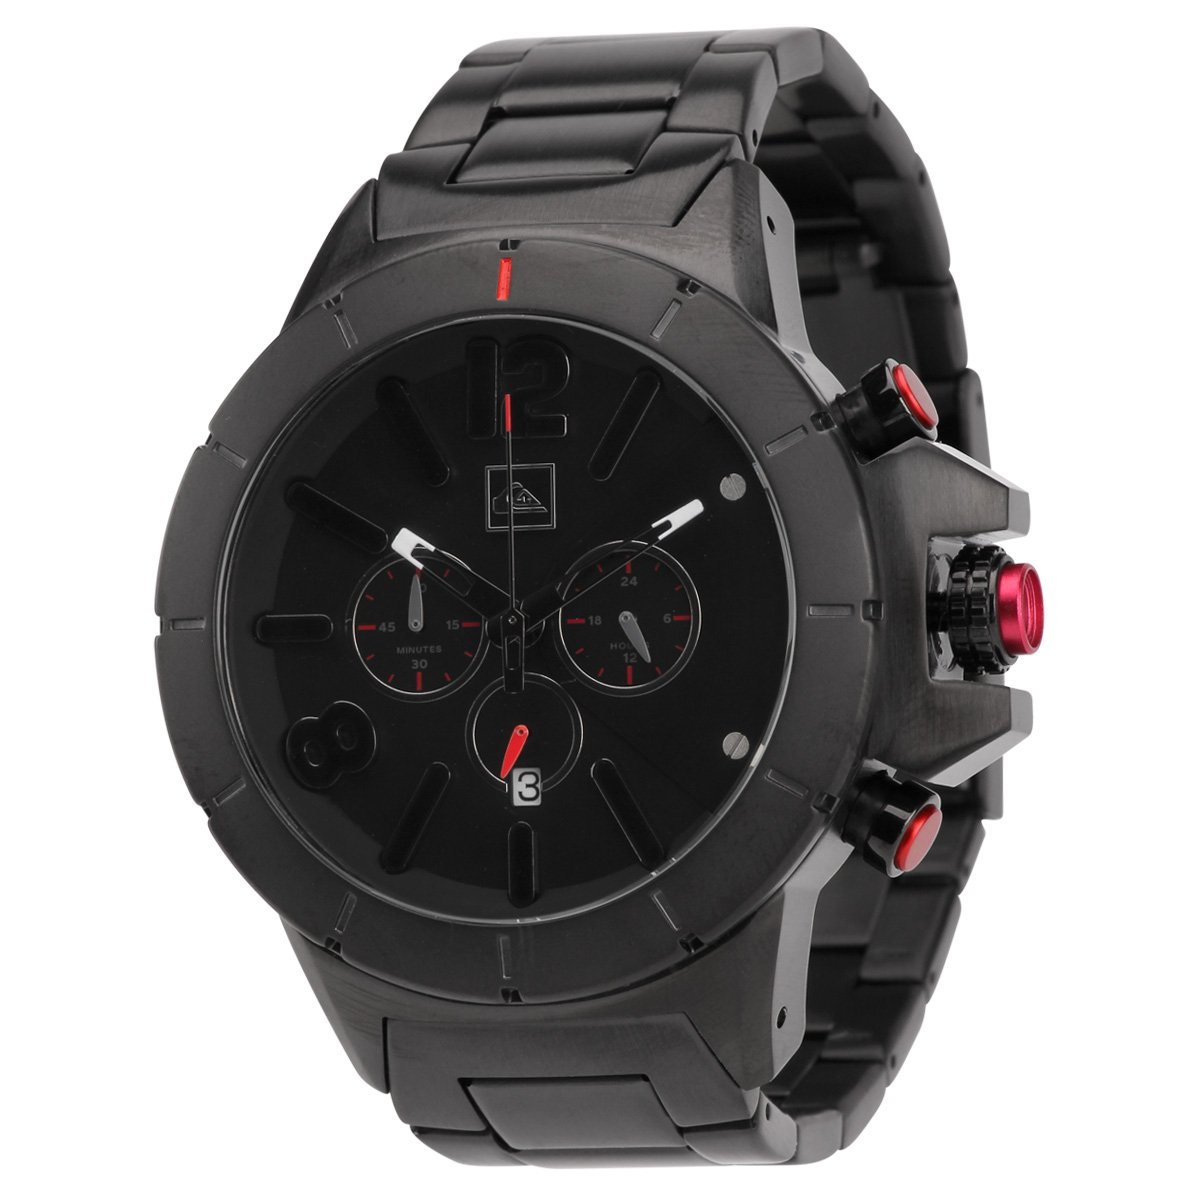 7759405bbd6 Relógio Quiksilver Kaspian Metal - Preto - Compre Agora